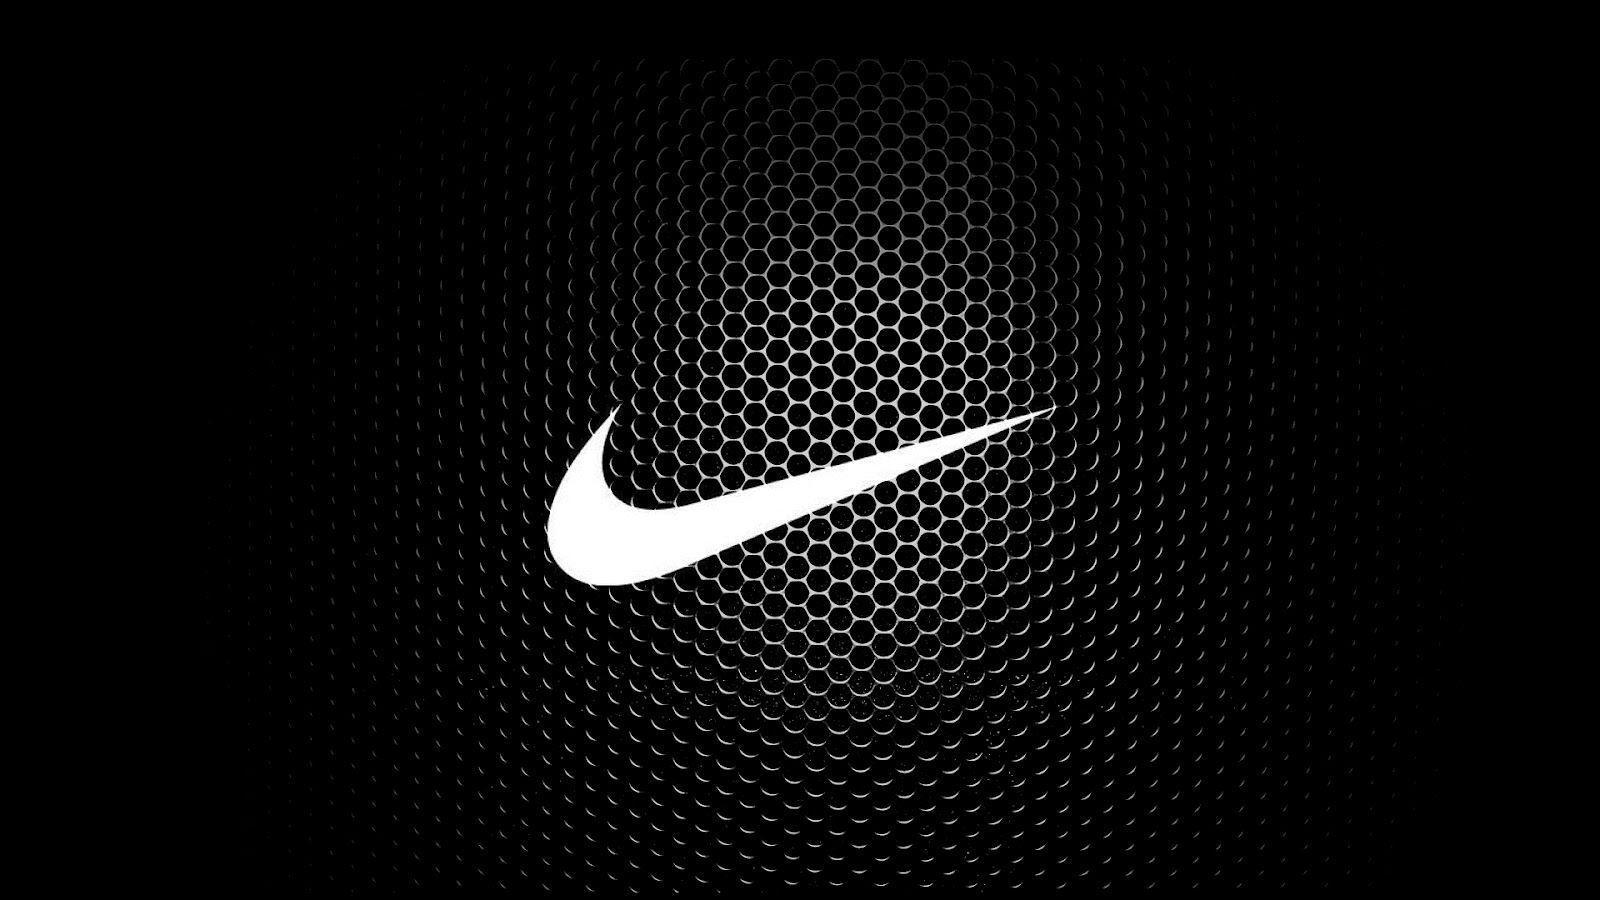 Free Nike Wallpaper Backgrounds